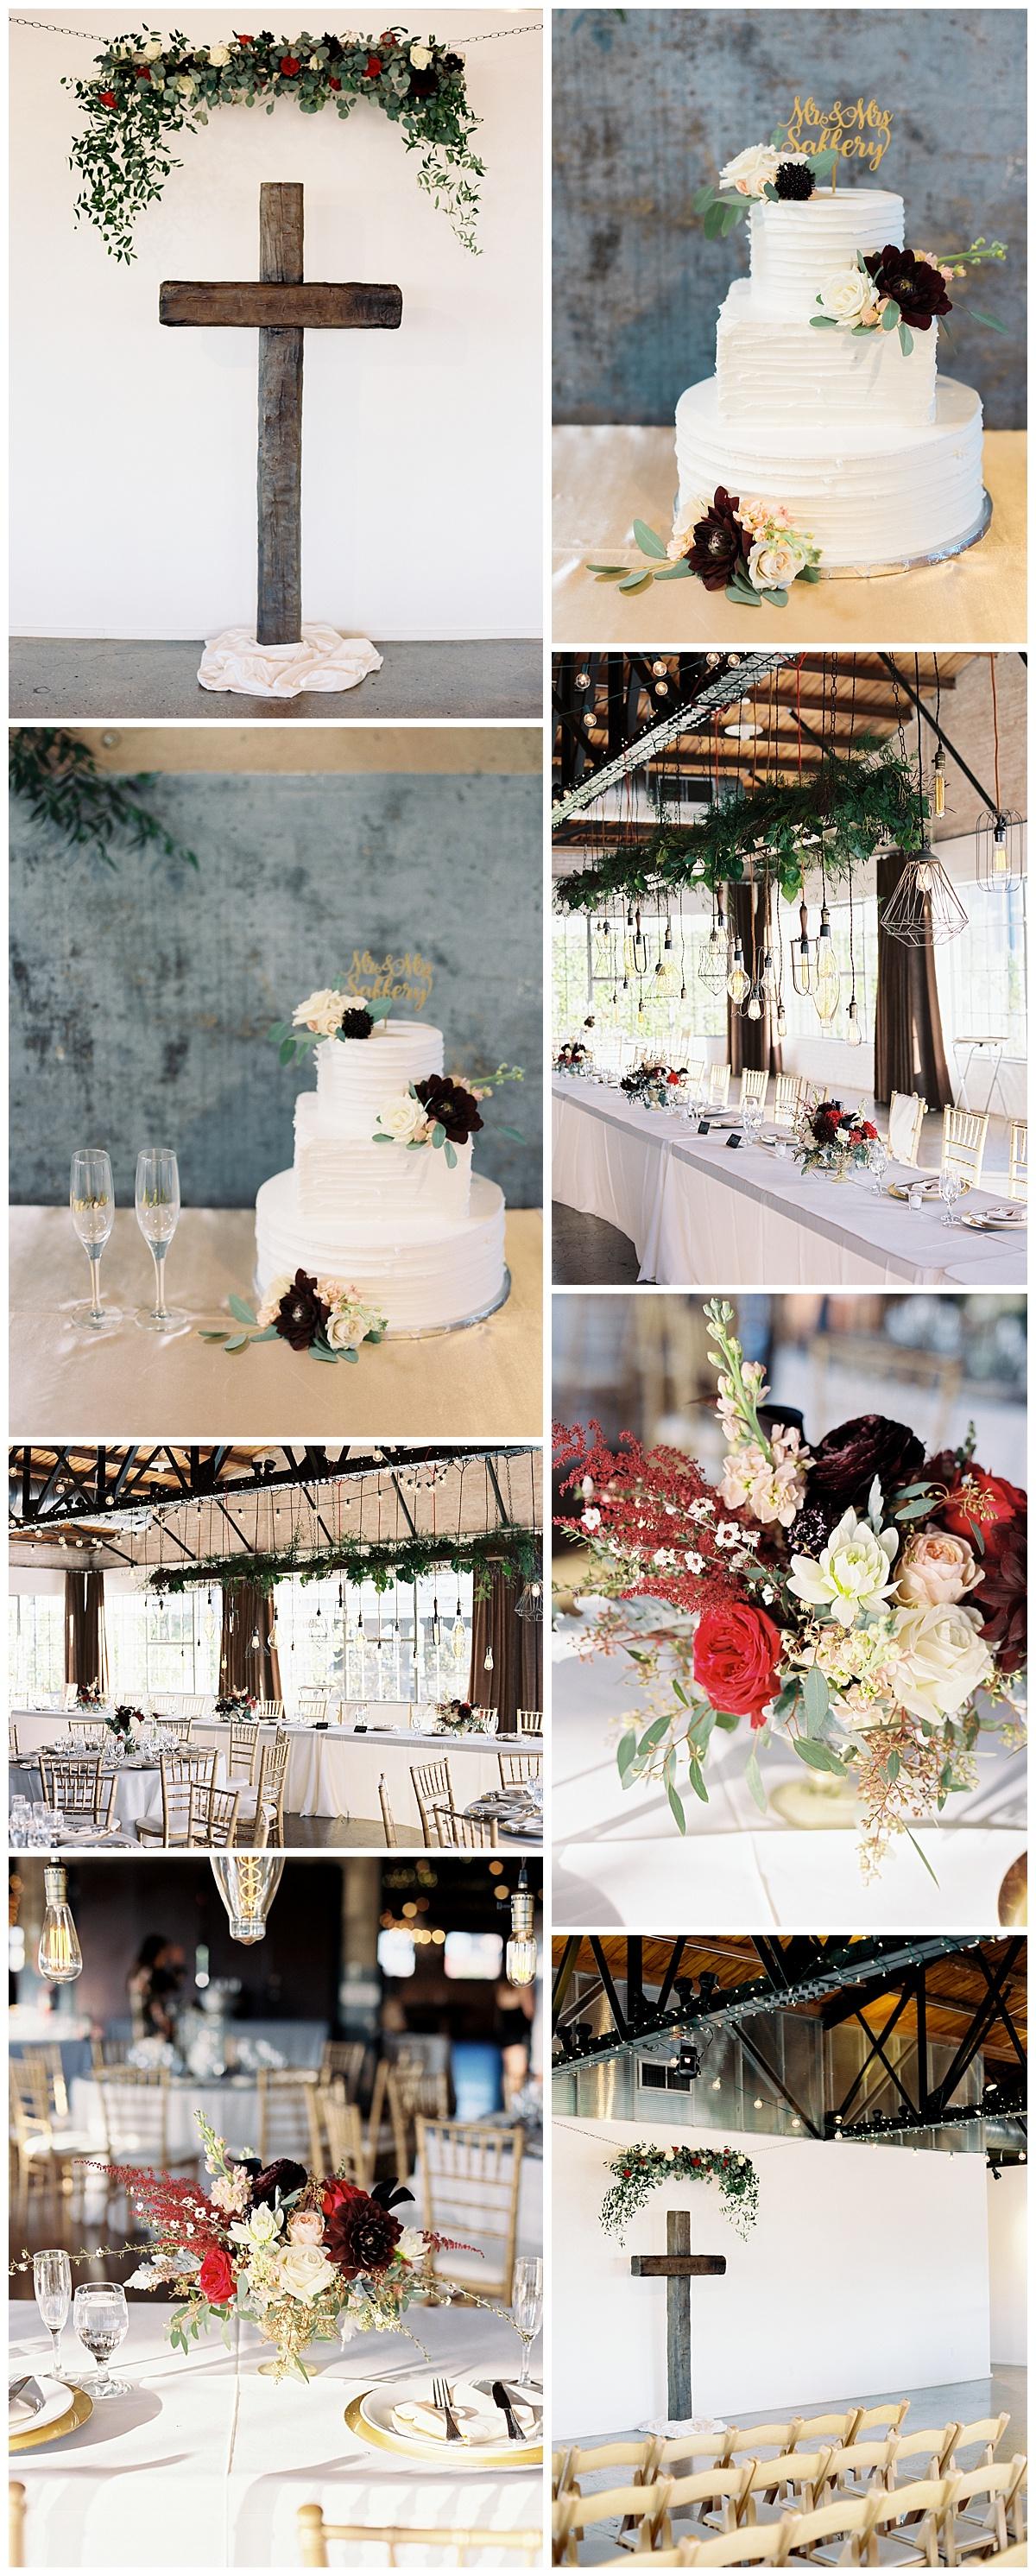 hickory-stree-annex-wedding-ar-photography-nicole-nolan-4.jpg